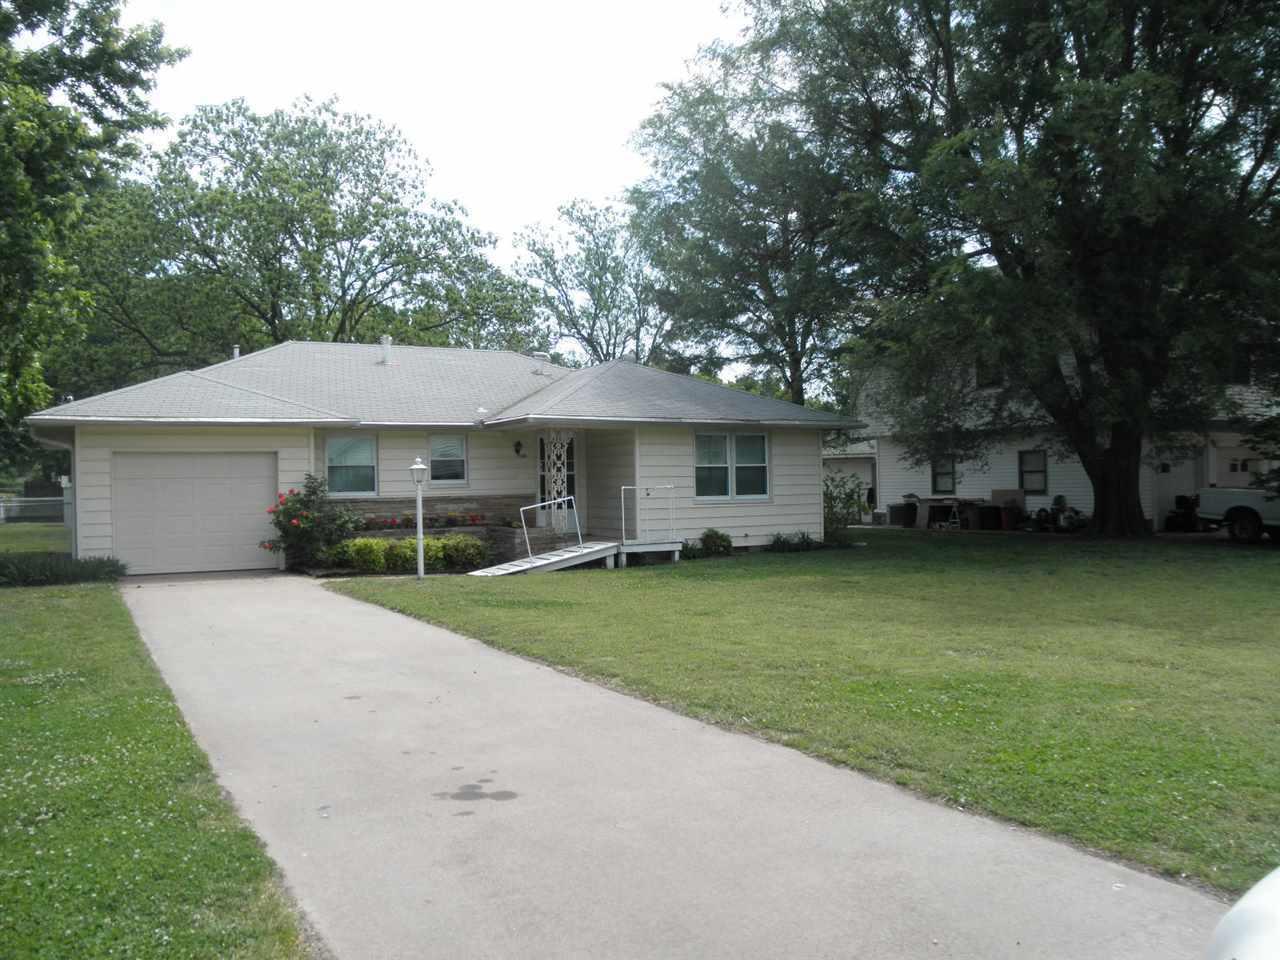 Sold Intraoffice W/MLS | 305 N Flormable  Ponca City, OK 74601 0